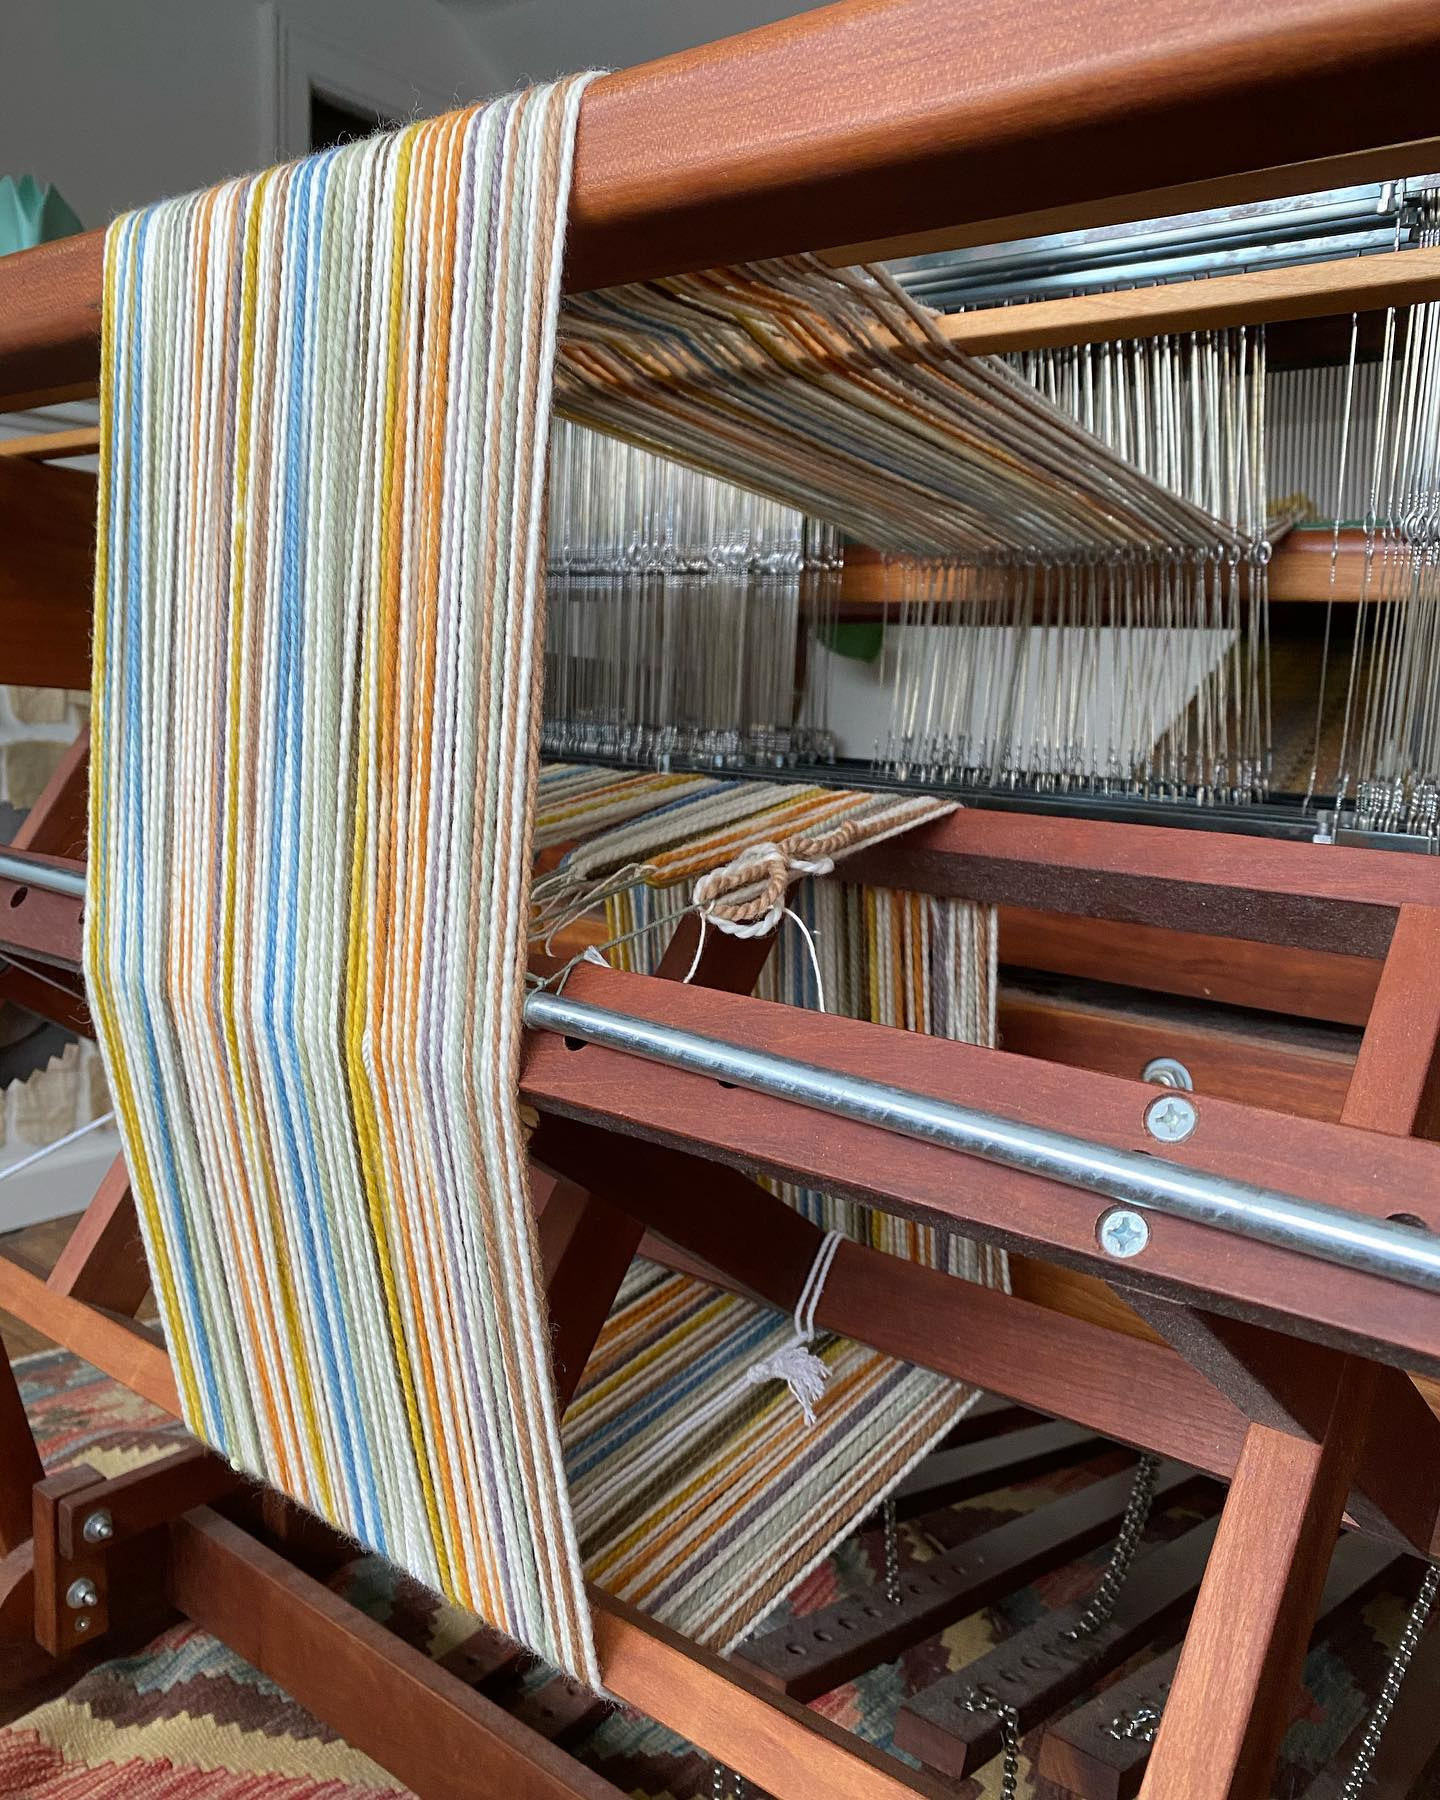 Kayla Powers weaver